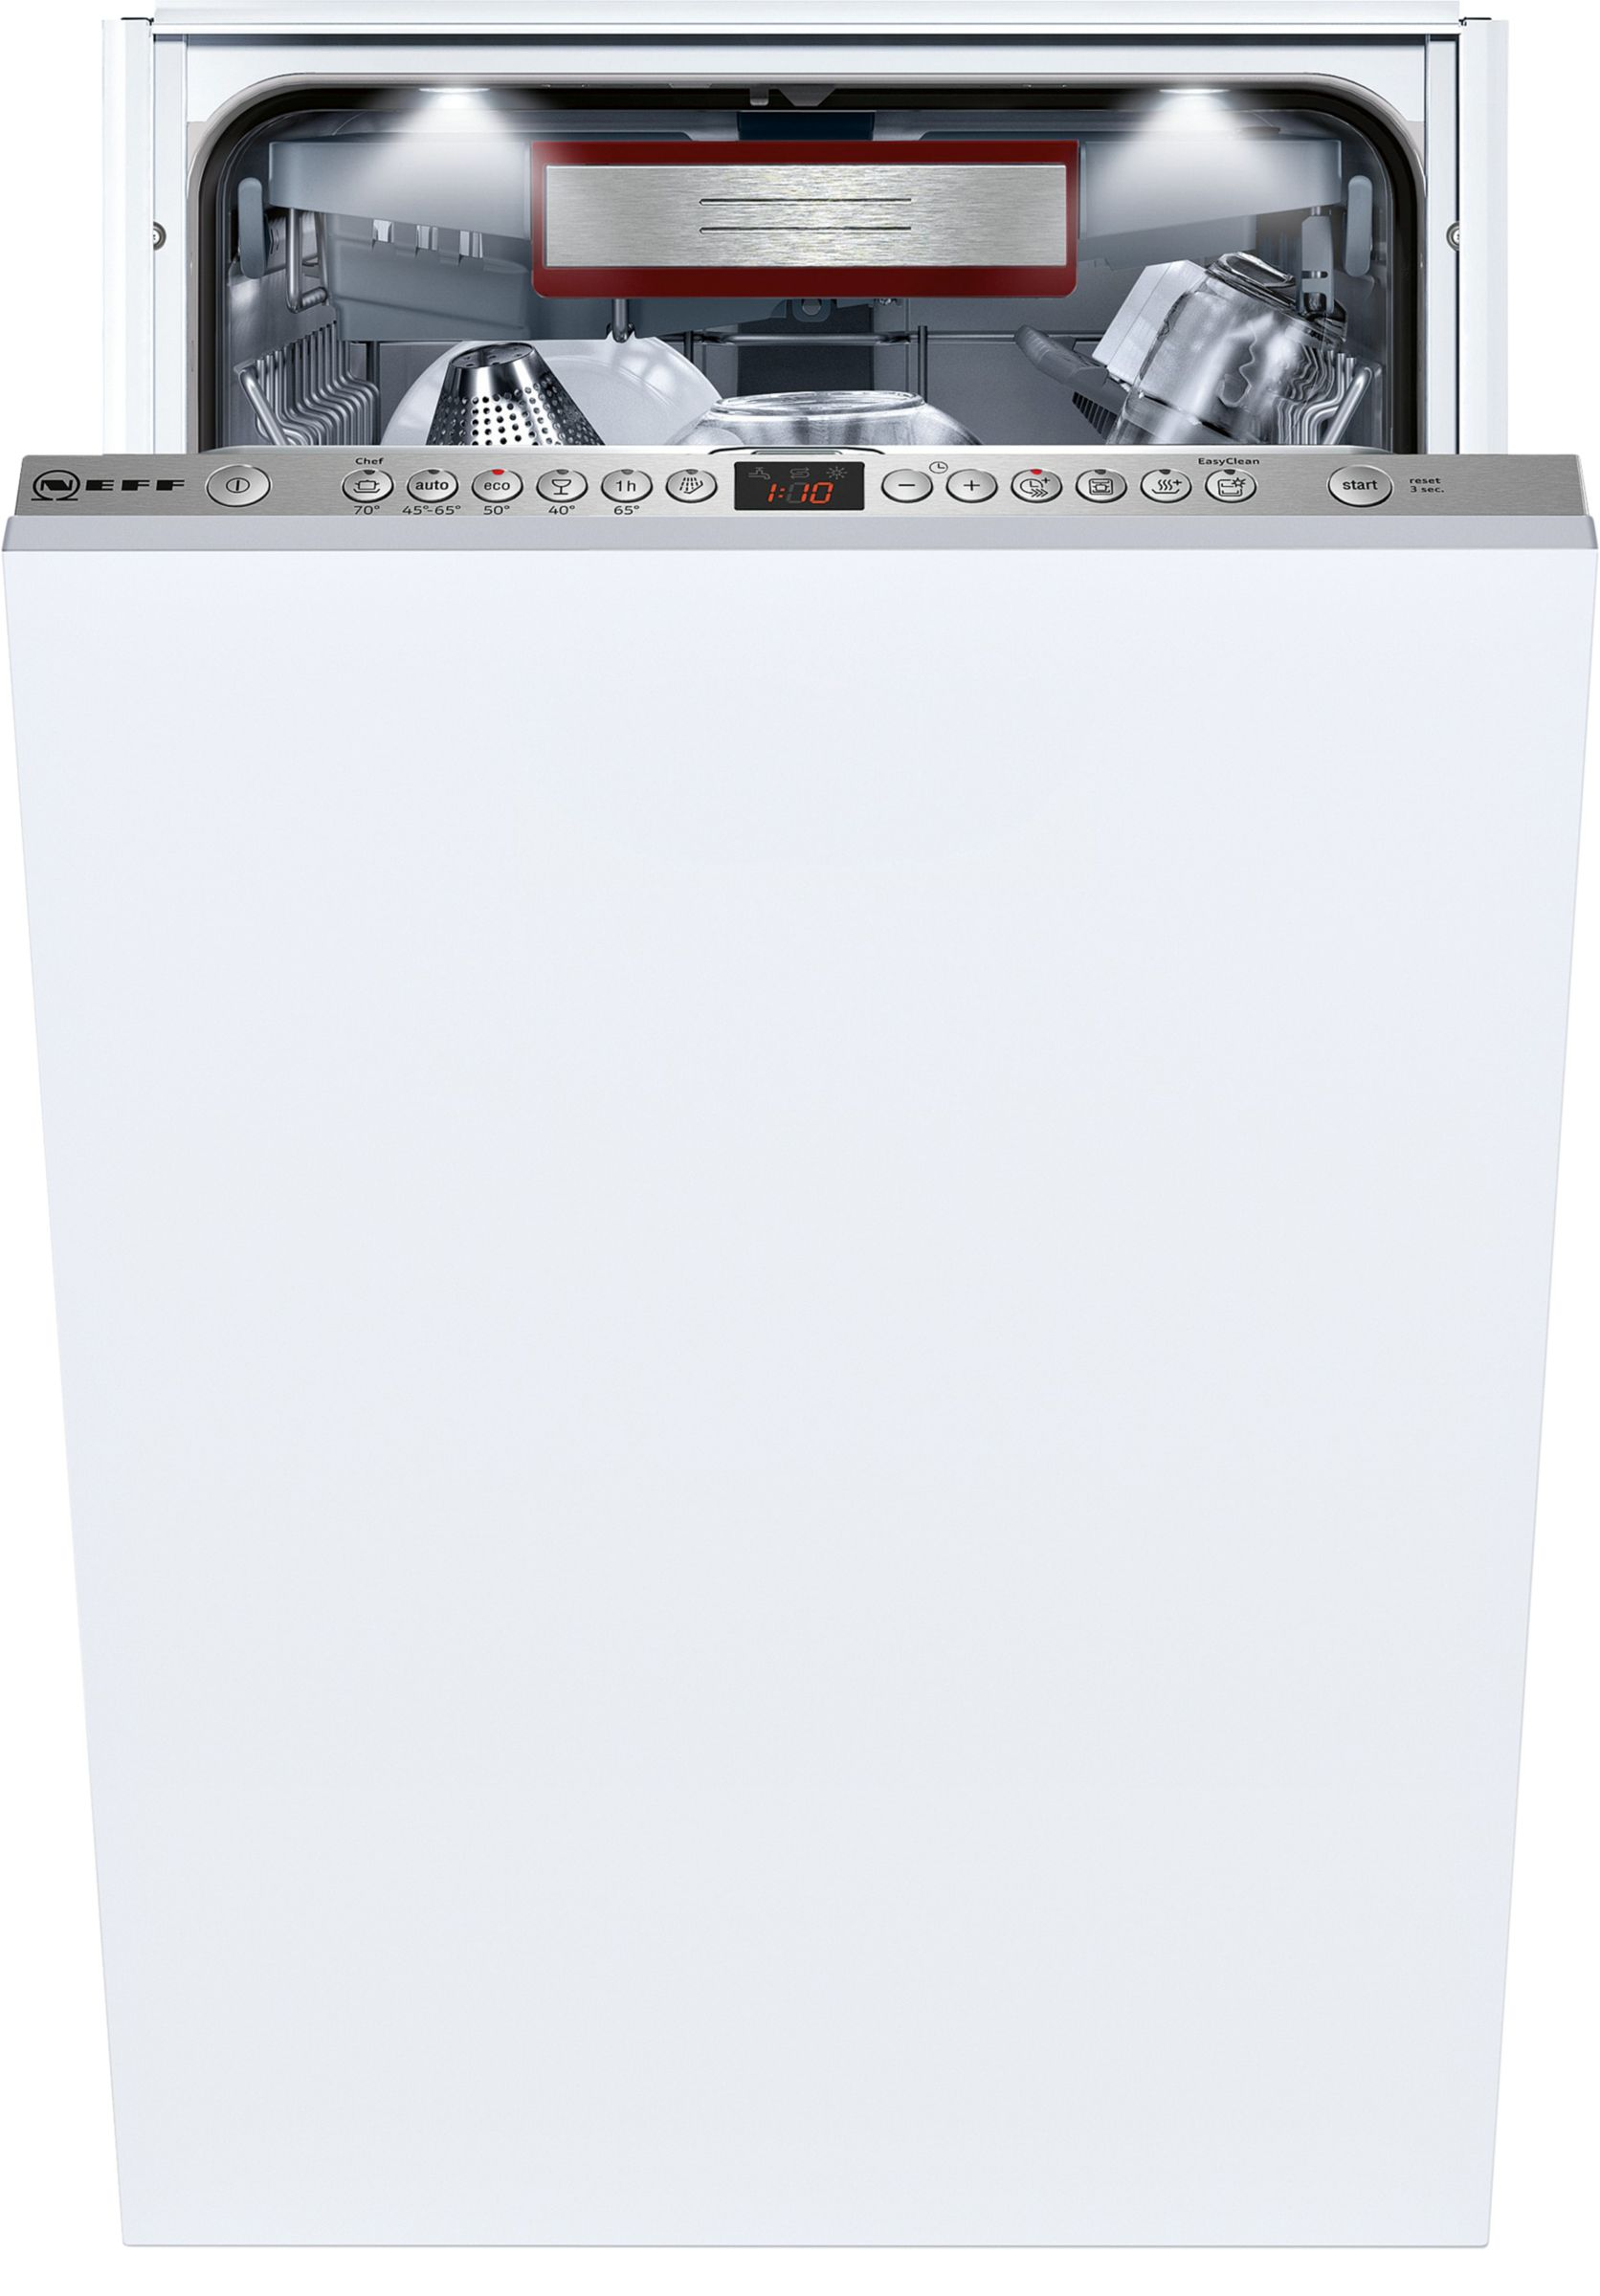 NEFF Neff S586T60D0G Integrated Slimline Dishwasher, White